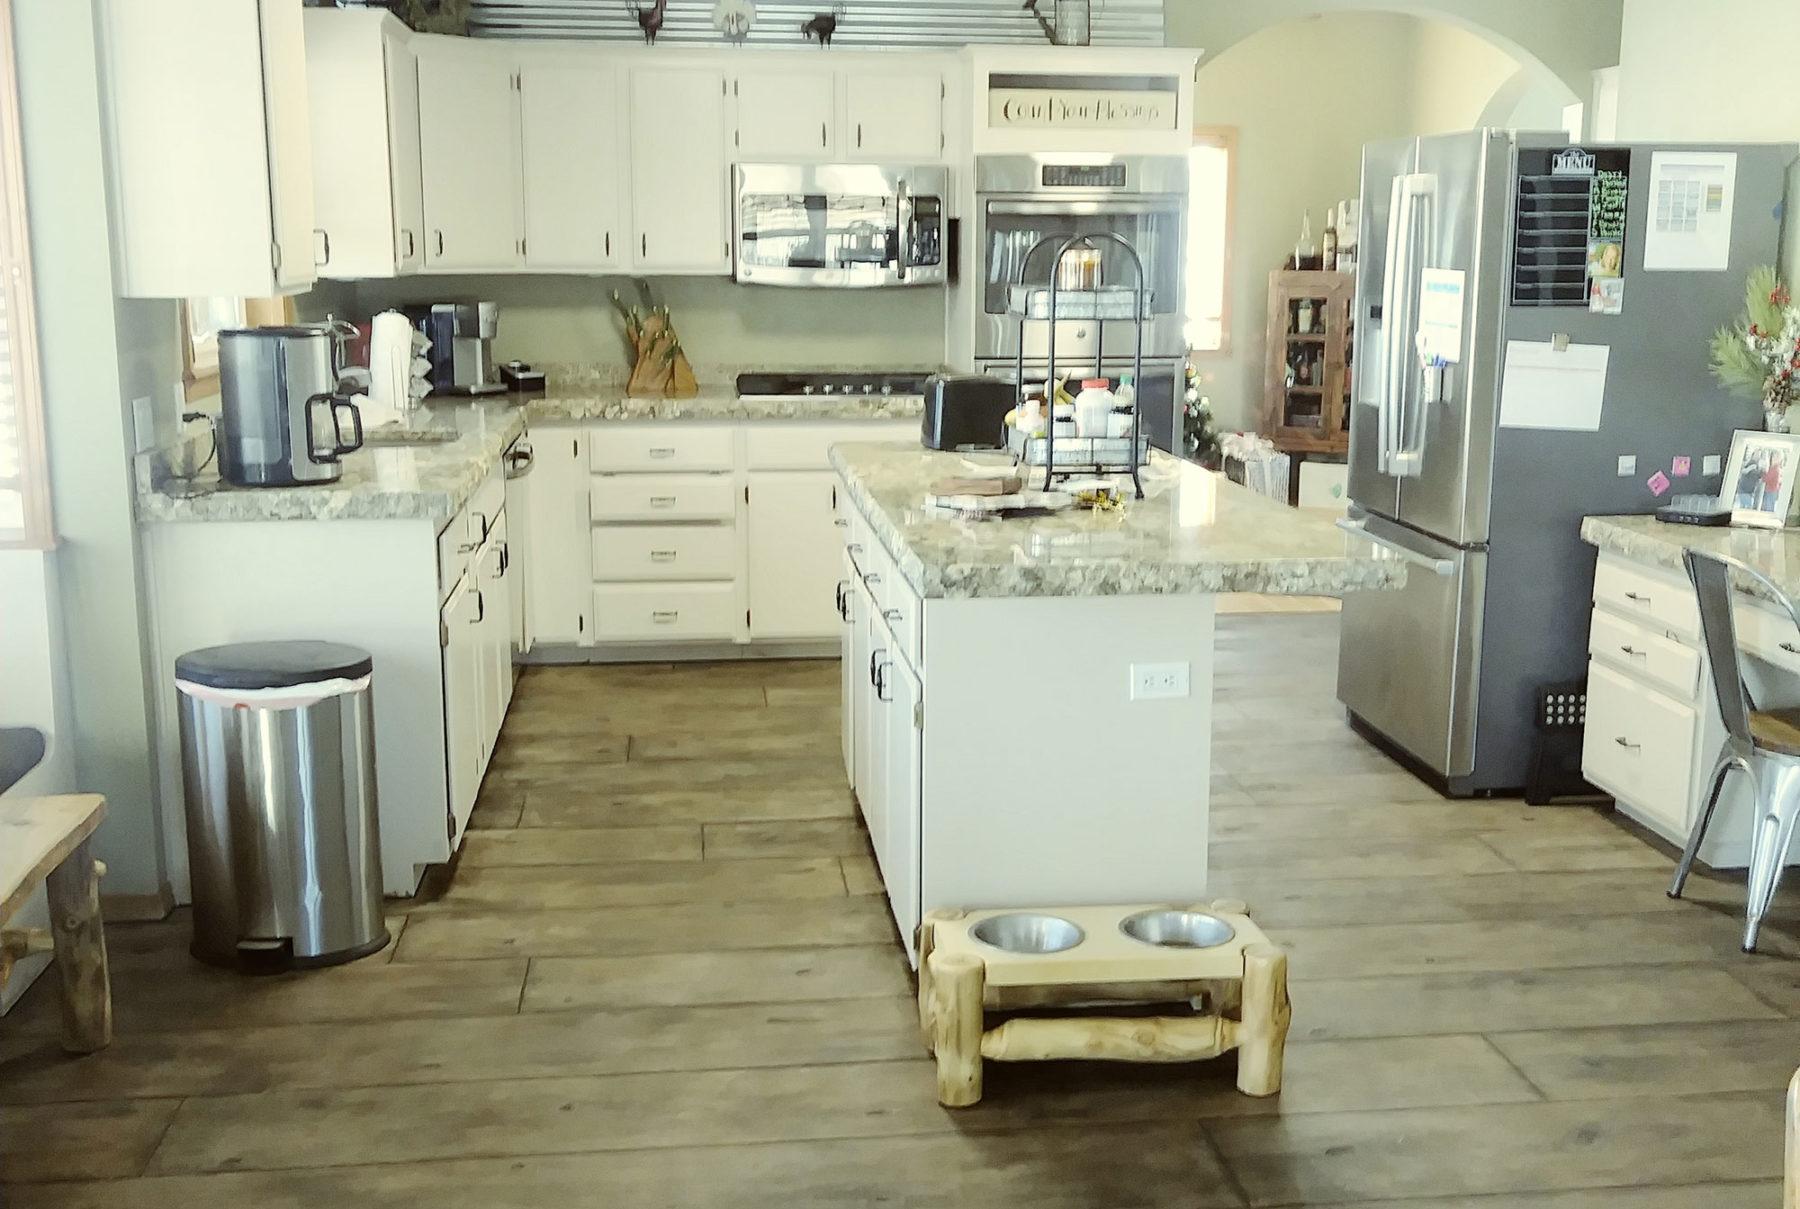 Kitchen Interior Rocky Mountain Resurfacing, Durango Colorado